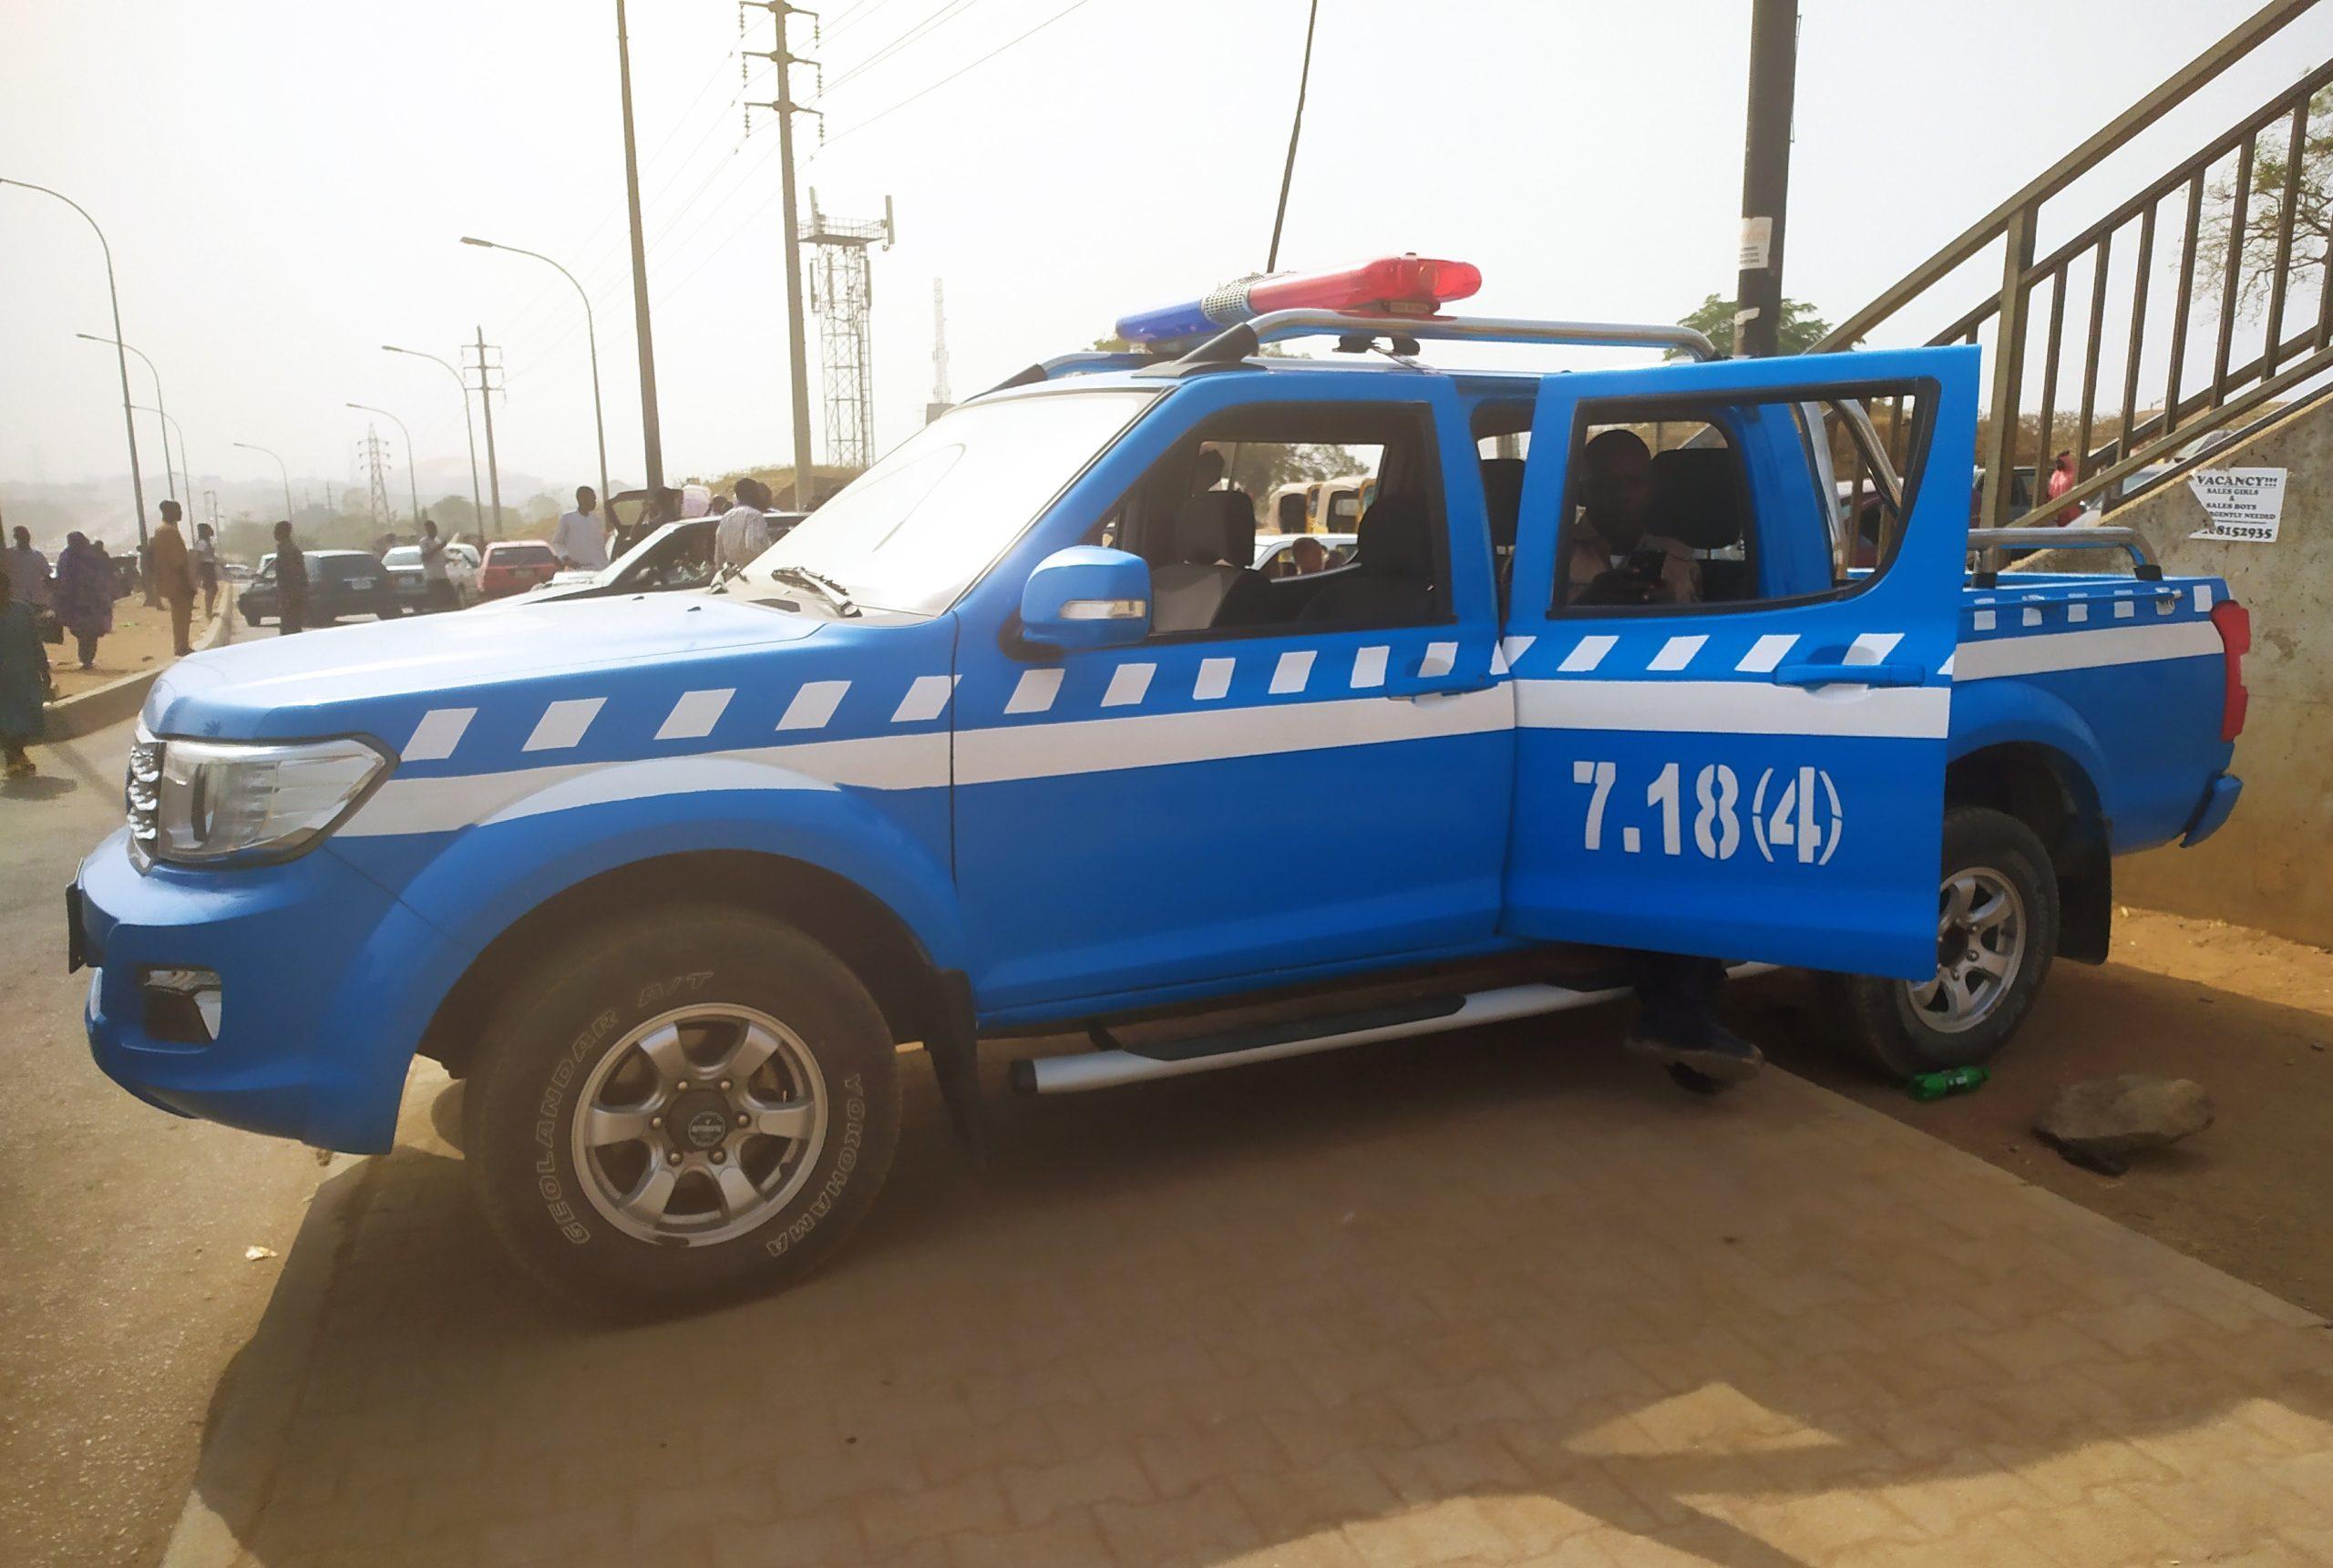 3 killed, 1 injured in Bauchi road crash – FRSC